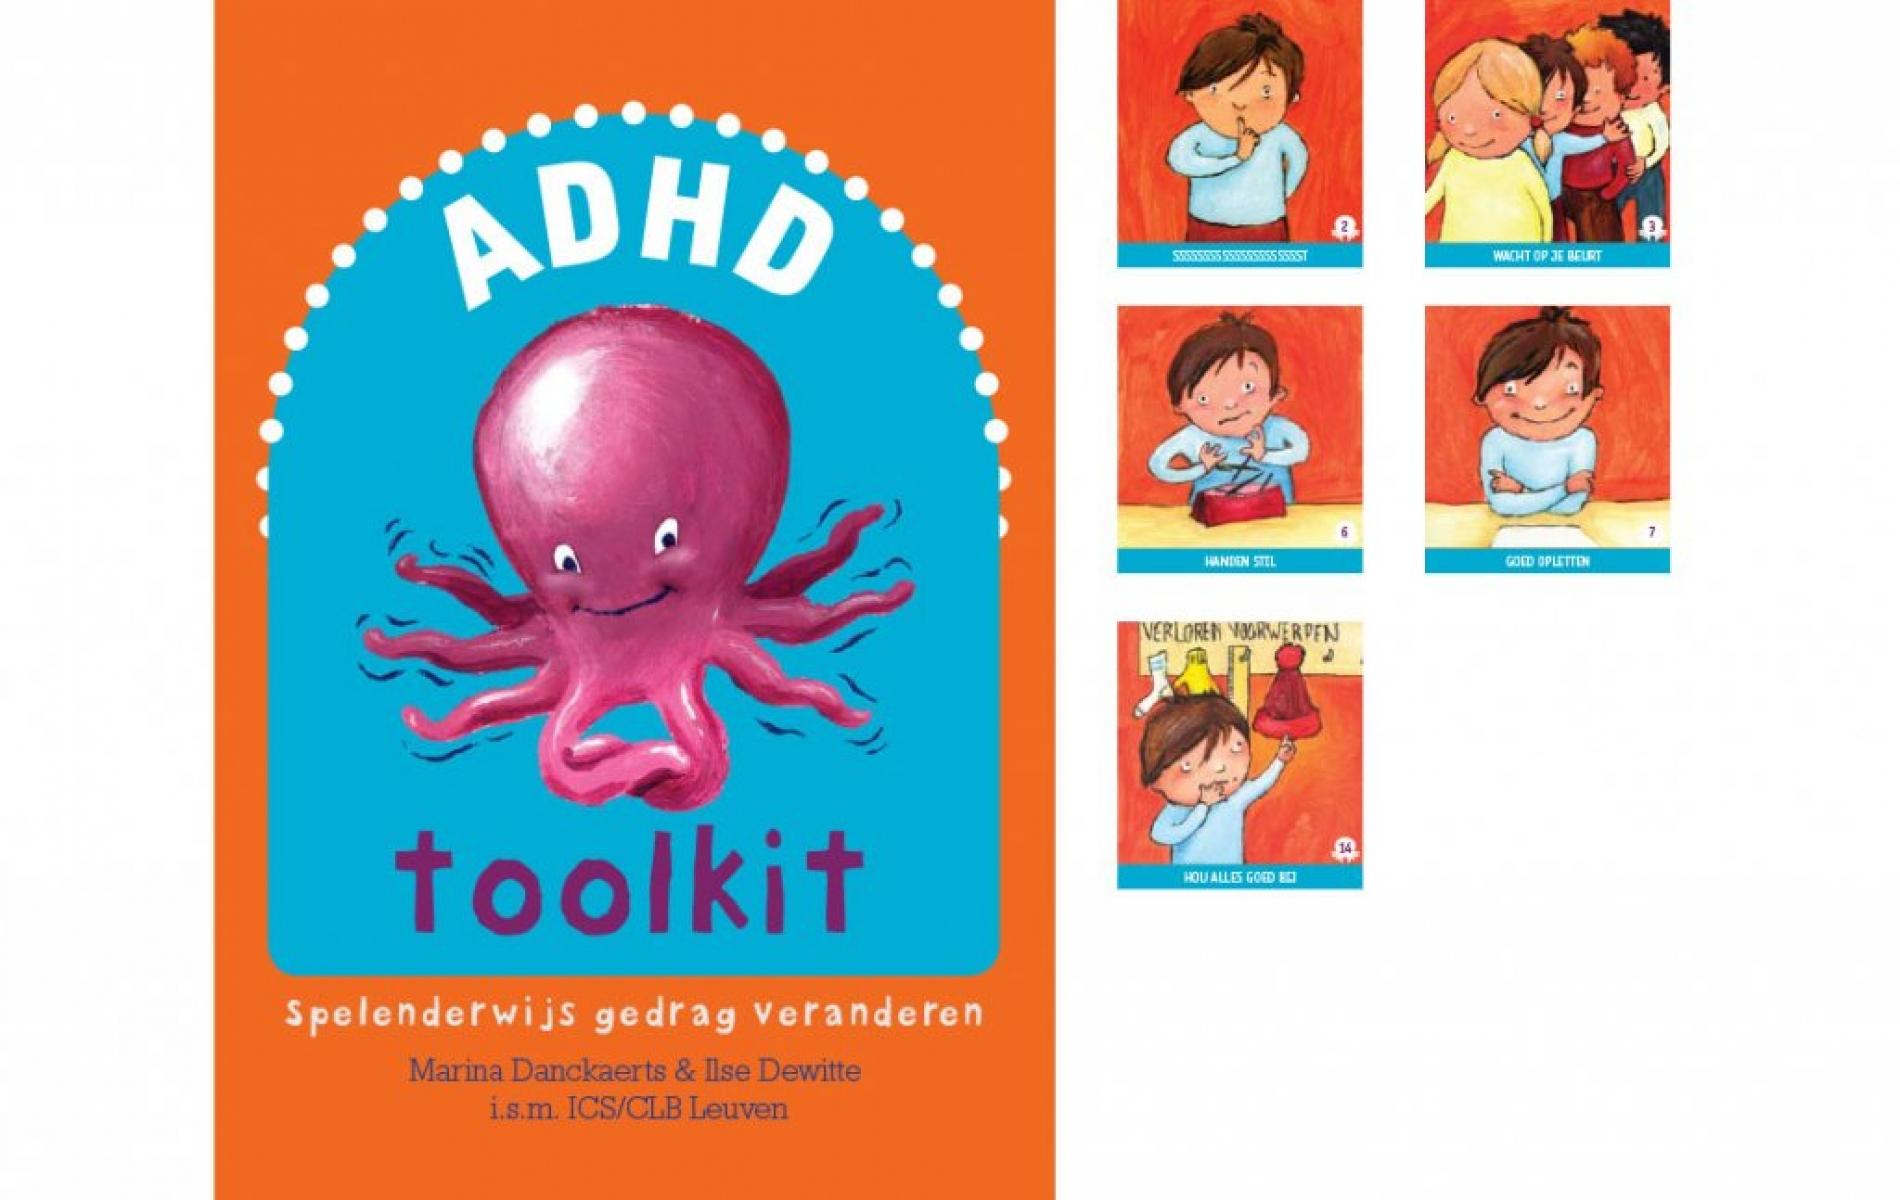 ADHD toolkit